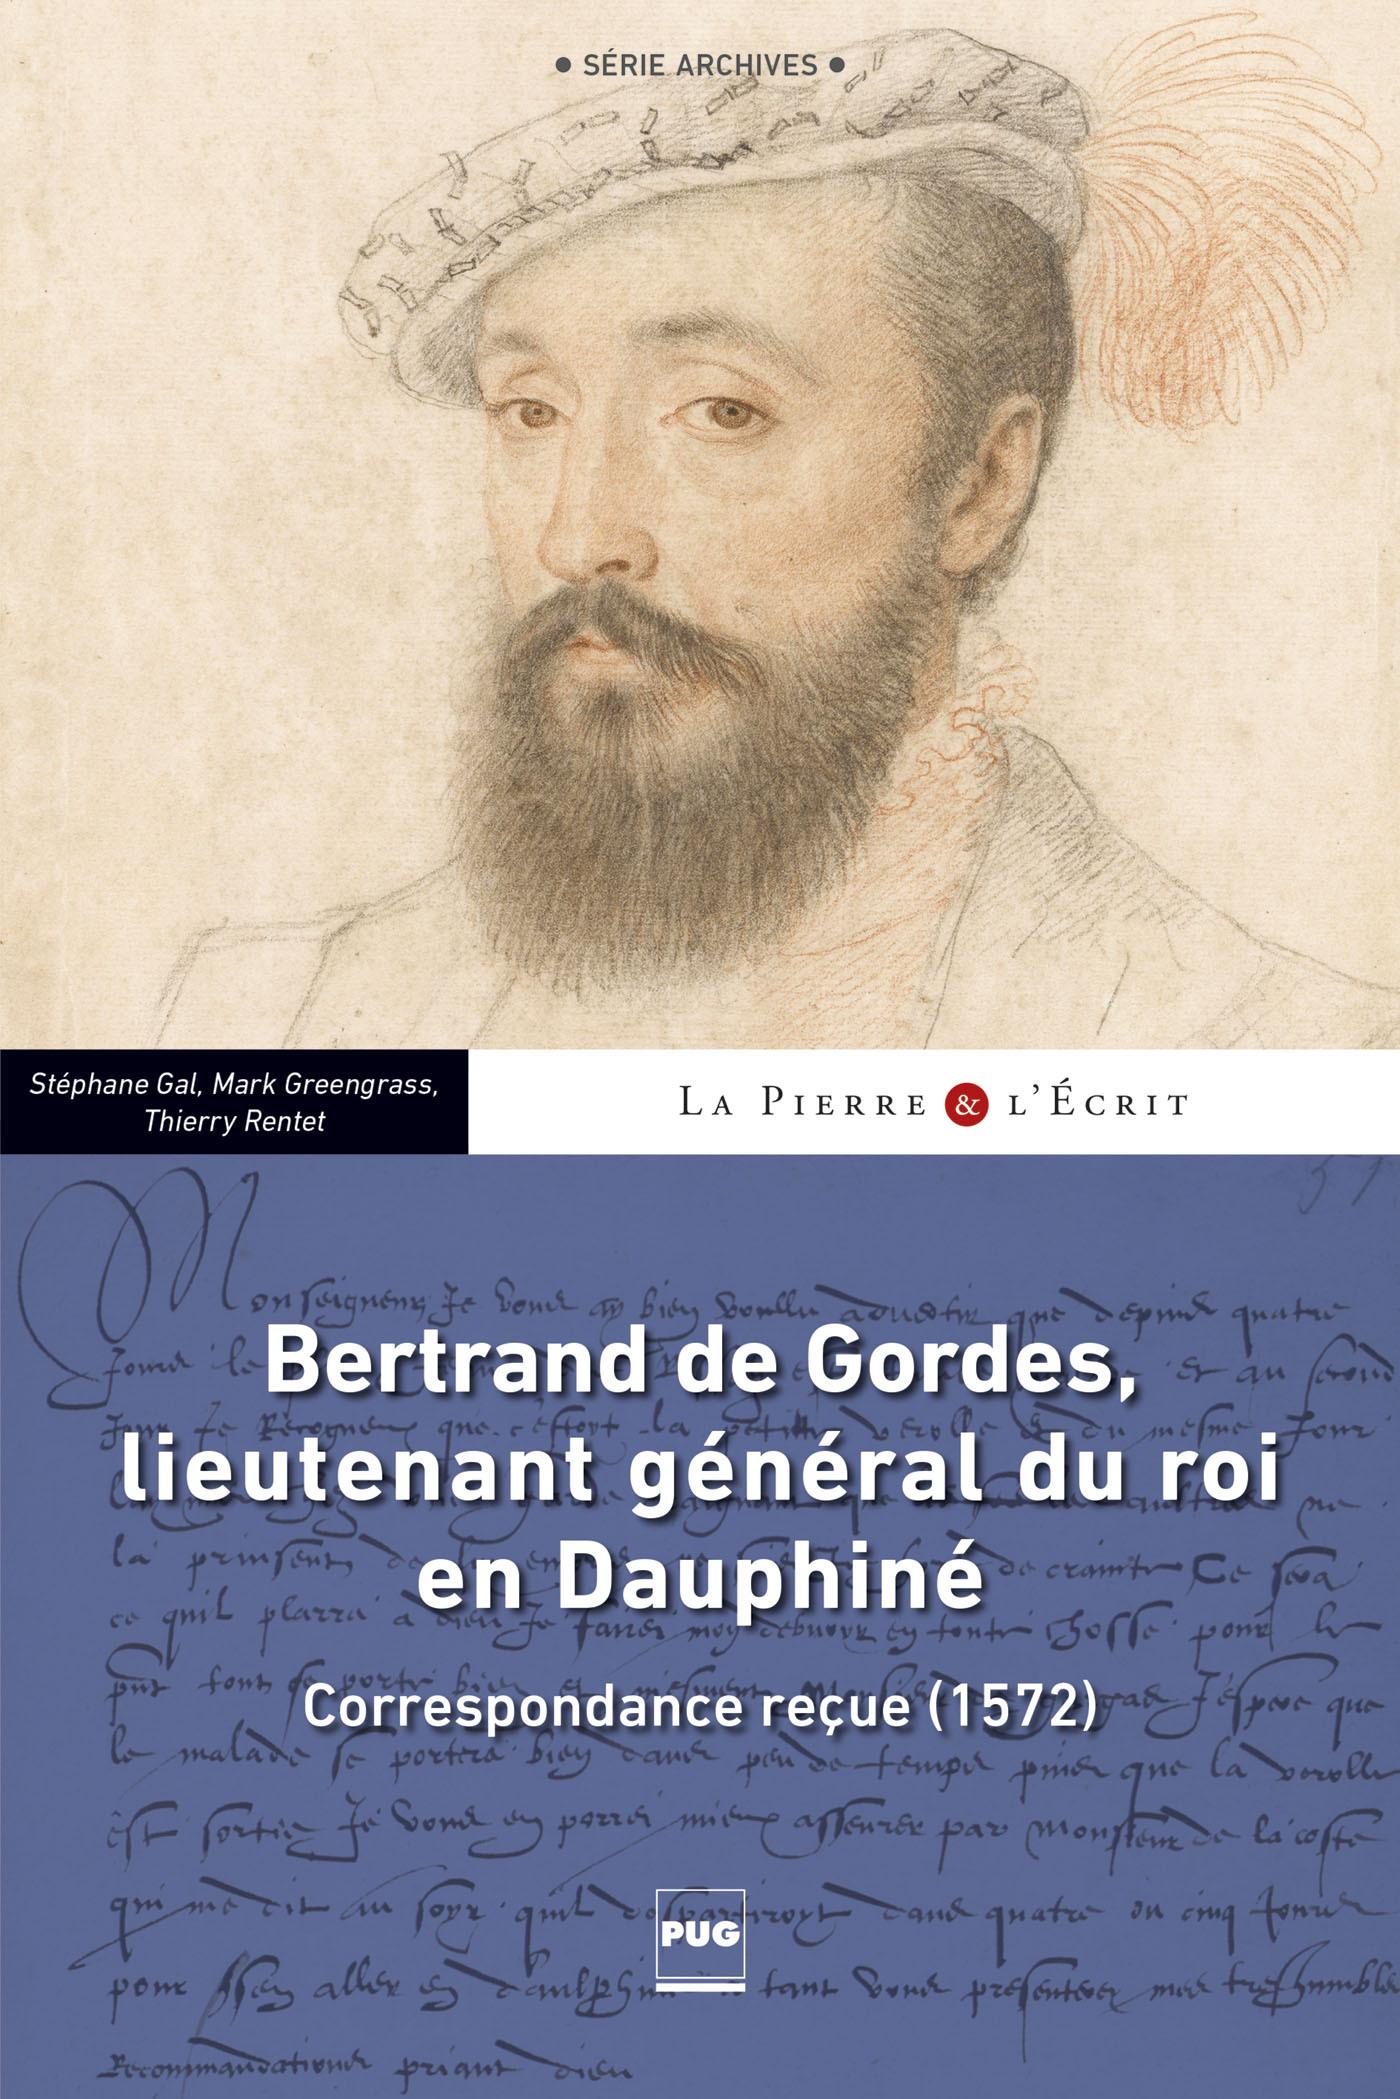 BERTRAND DE GORDES, LIEUTENANT GENERAL DU ROI EN DAUPHINE